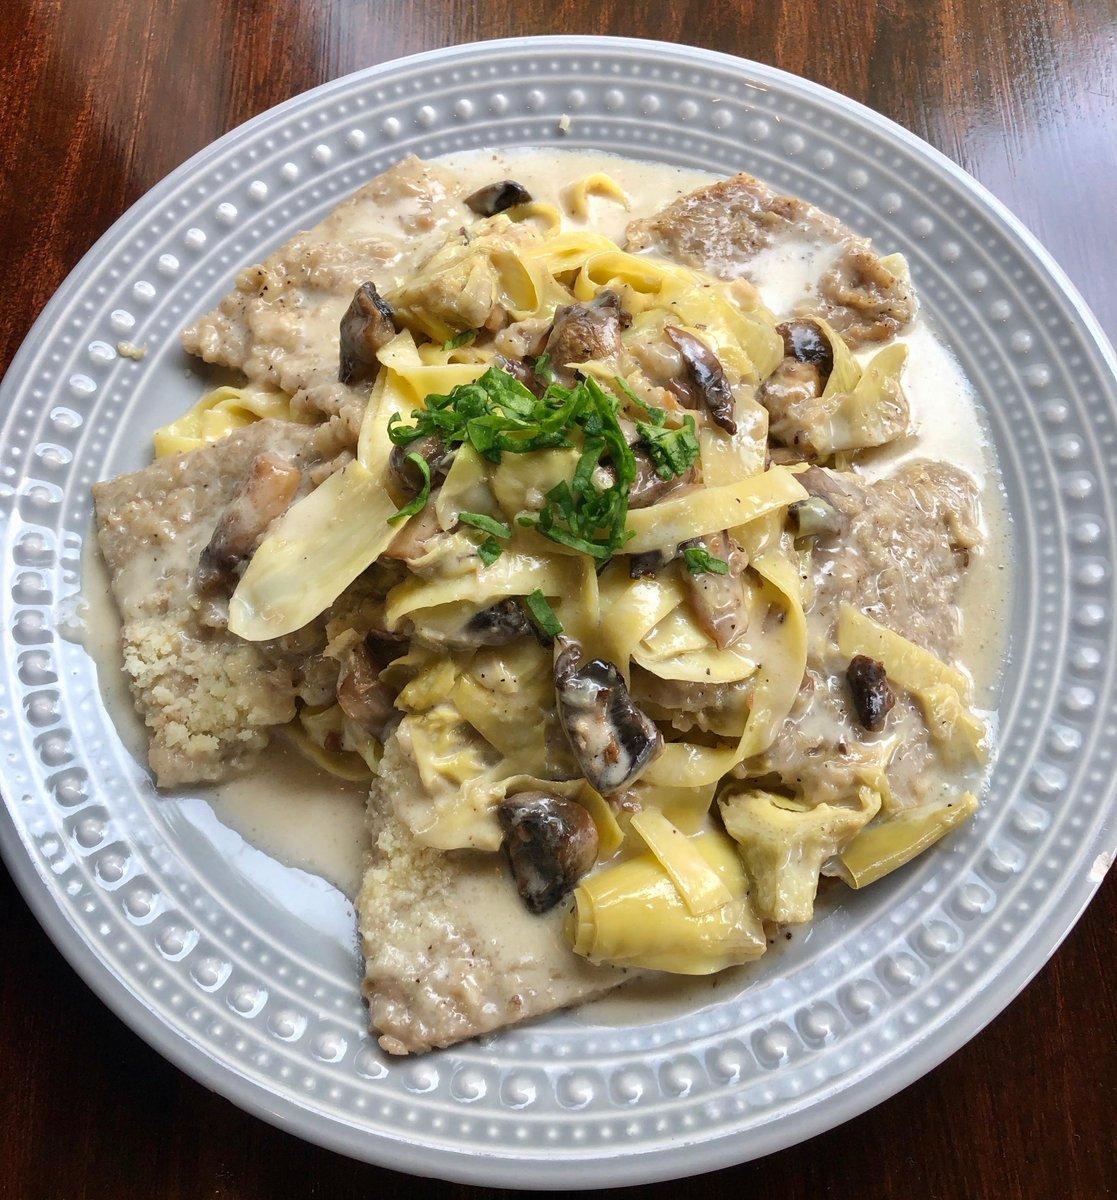 Tino's Weekend Specials Are In!!  flavorful Broccoli&Cheddar soup,  tasty Shrimp Gondola App,  amazingly delicious Veal Montebianco,  yummy Nutella Brownie Dessert.  Raymond Collection or Sierra Cantabria, Crianza  #TinosBistro #HoCoEats #HoCoMomsTalkAboutIt #HoCoDadspic.twitter.com/cYFAWzEgRP